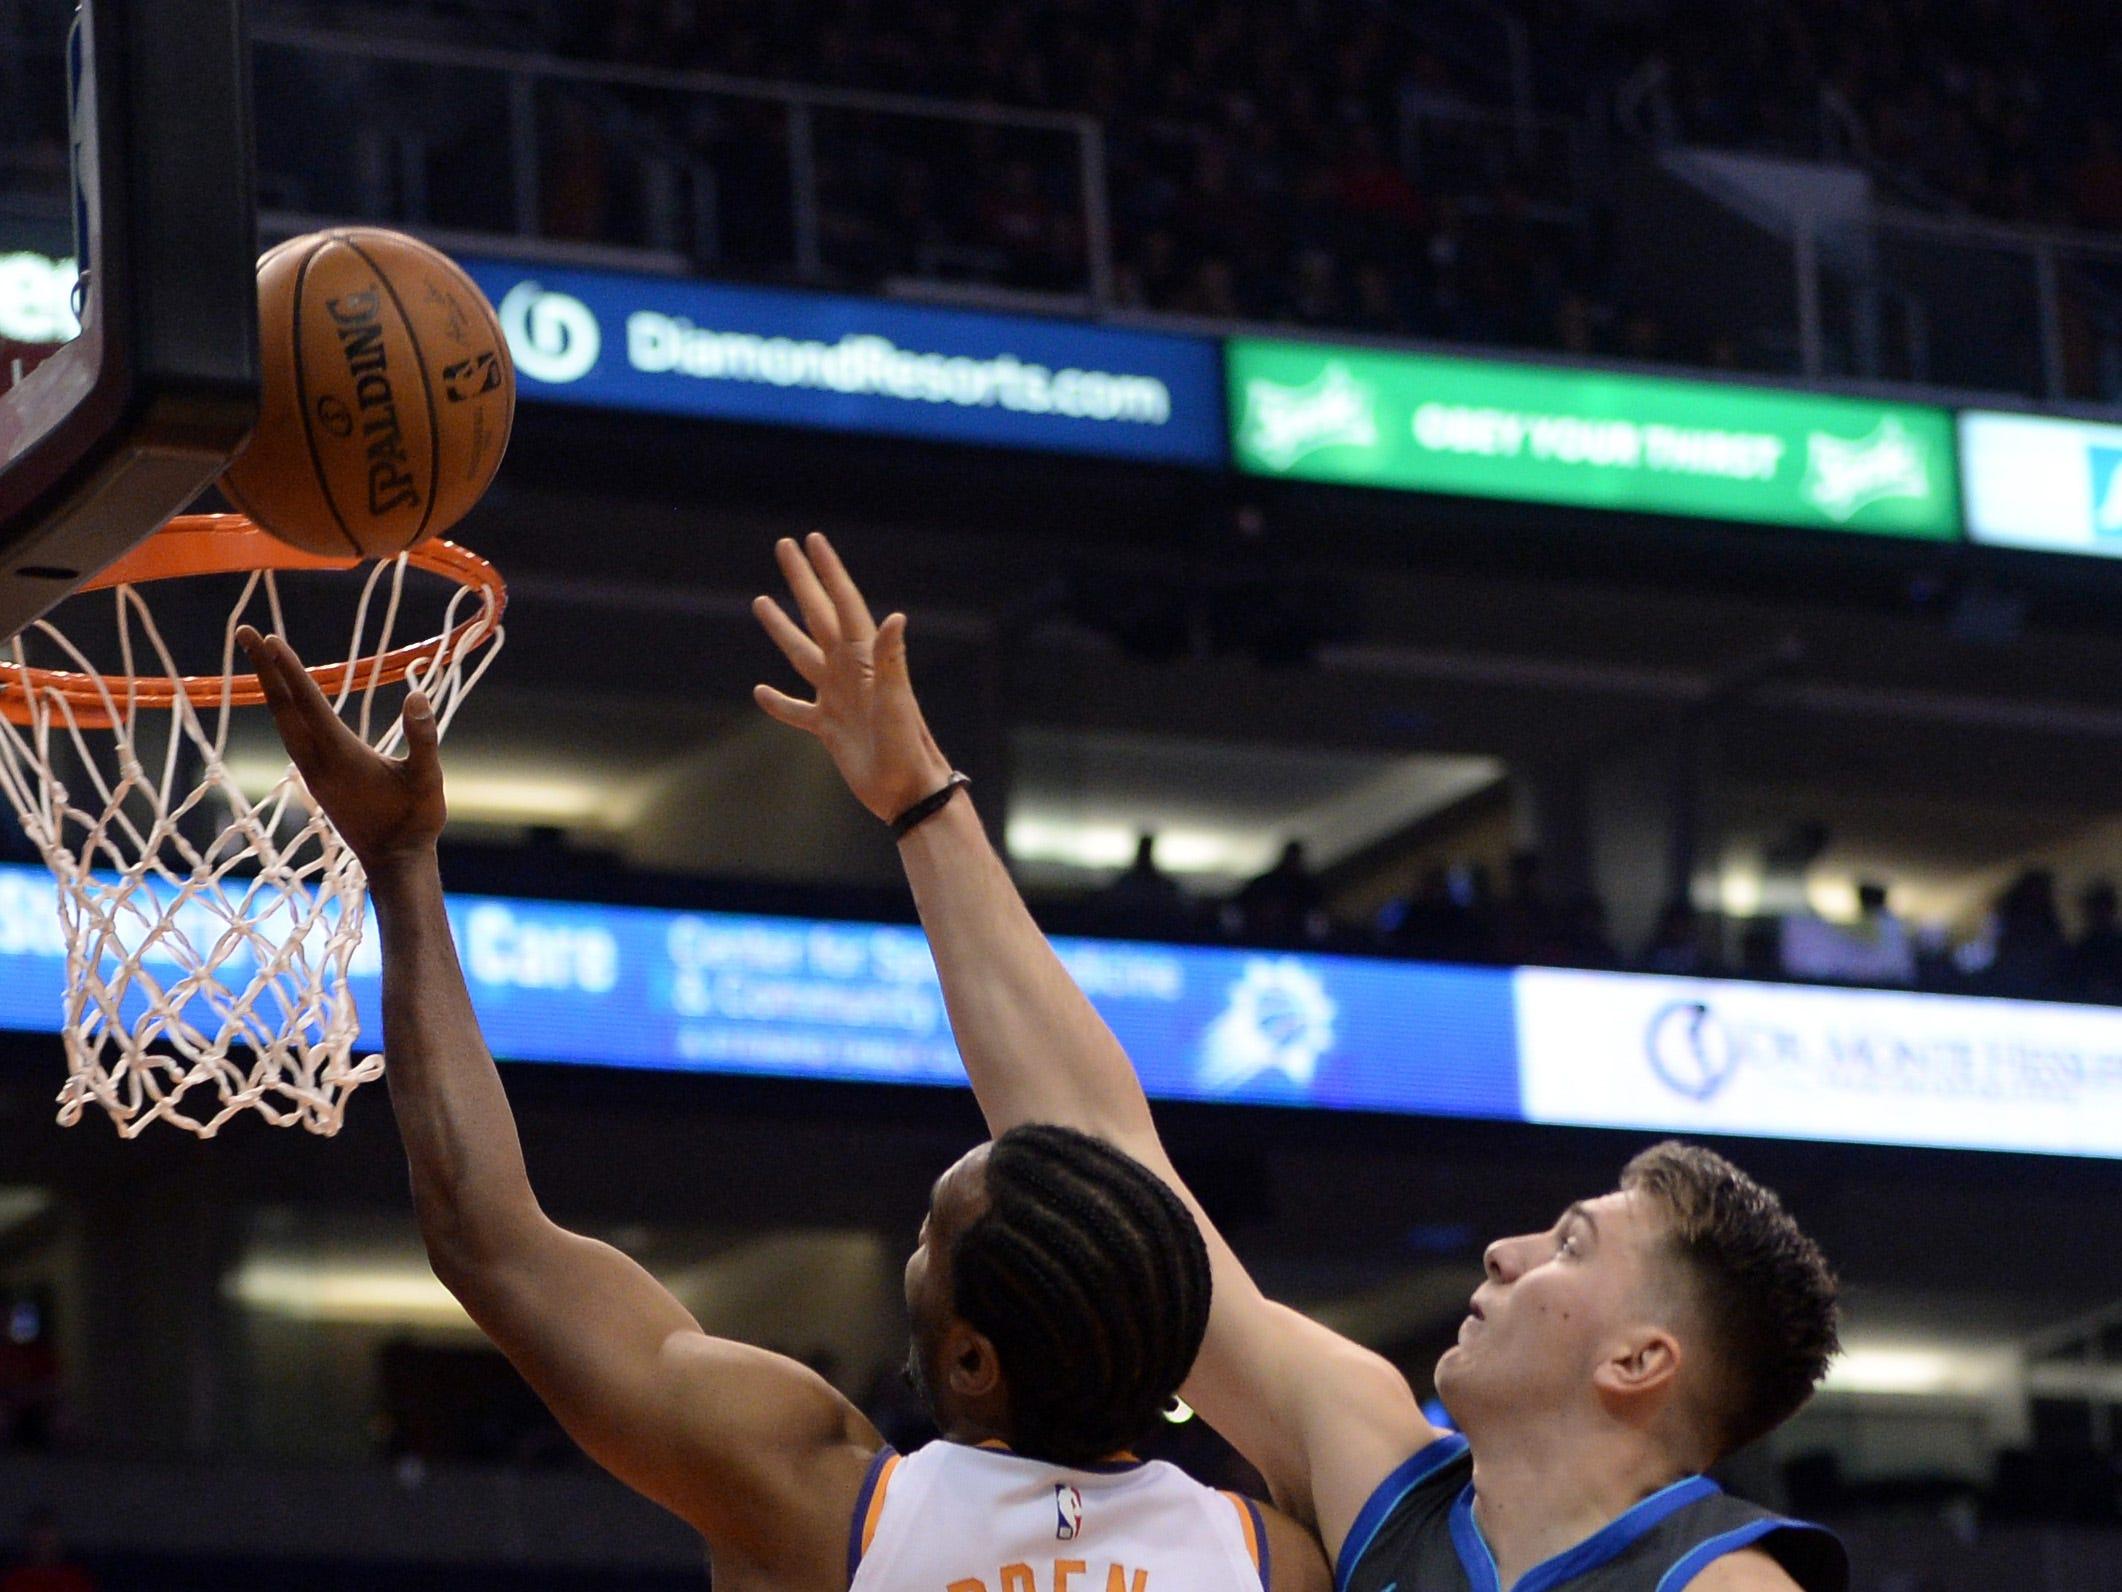 Dec 13, 2018; Phoenix, AZ, USA; Phoenix Suns forward T.J. Warren (12) puts up a layup over Dallas Mavericks forward Luka Doncic (77) during the first half at Talking Stick Resort Arena. Mandatory Credit: Joe Camporeale-USA TODAY Sports